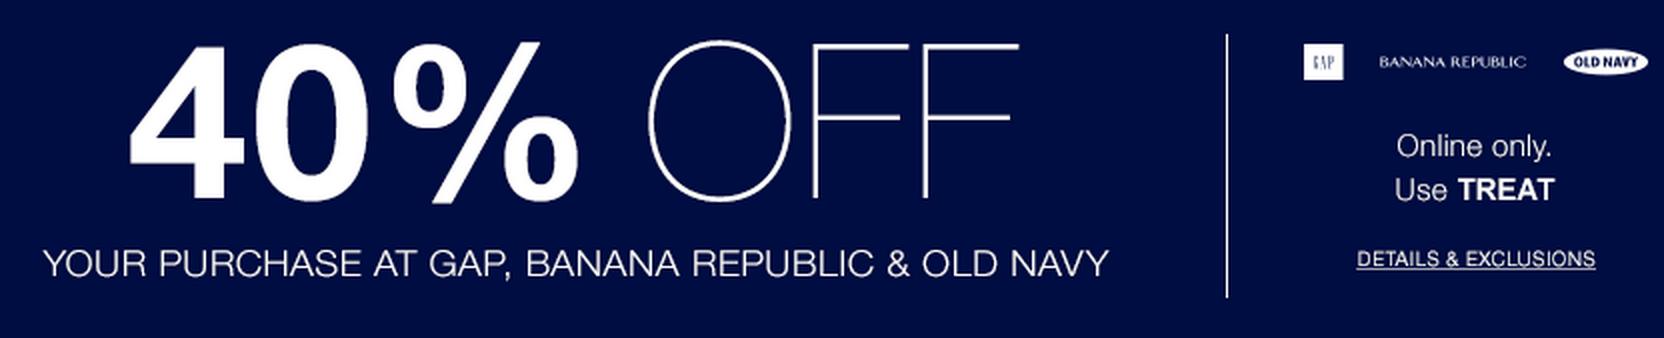 Gap-old-navy-banana-republic-sale